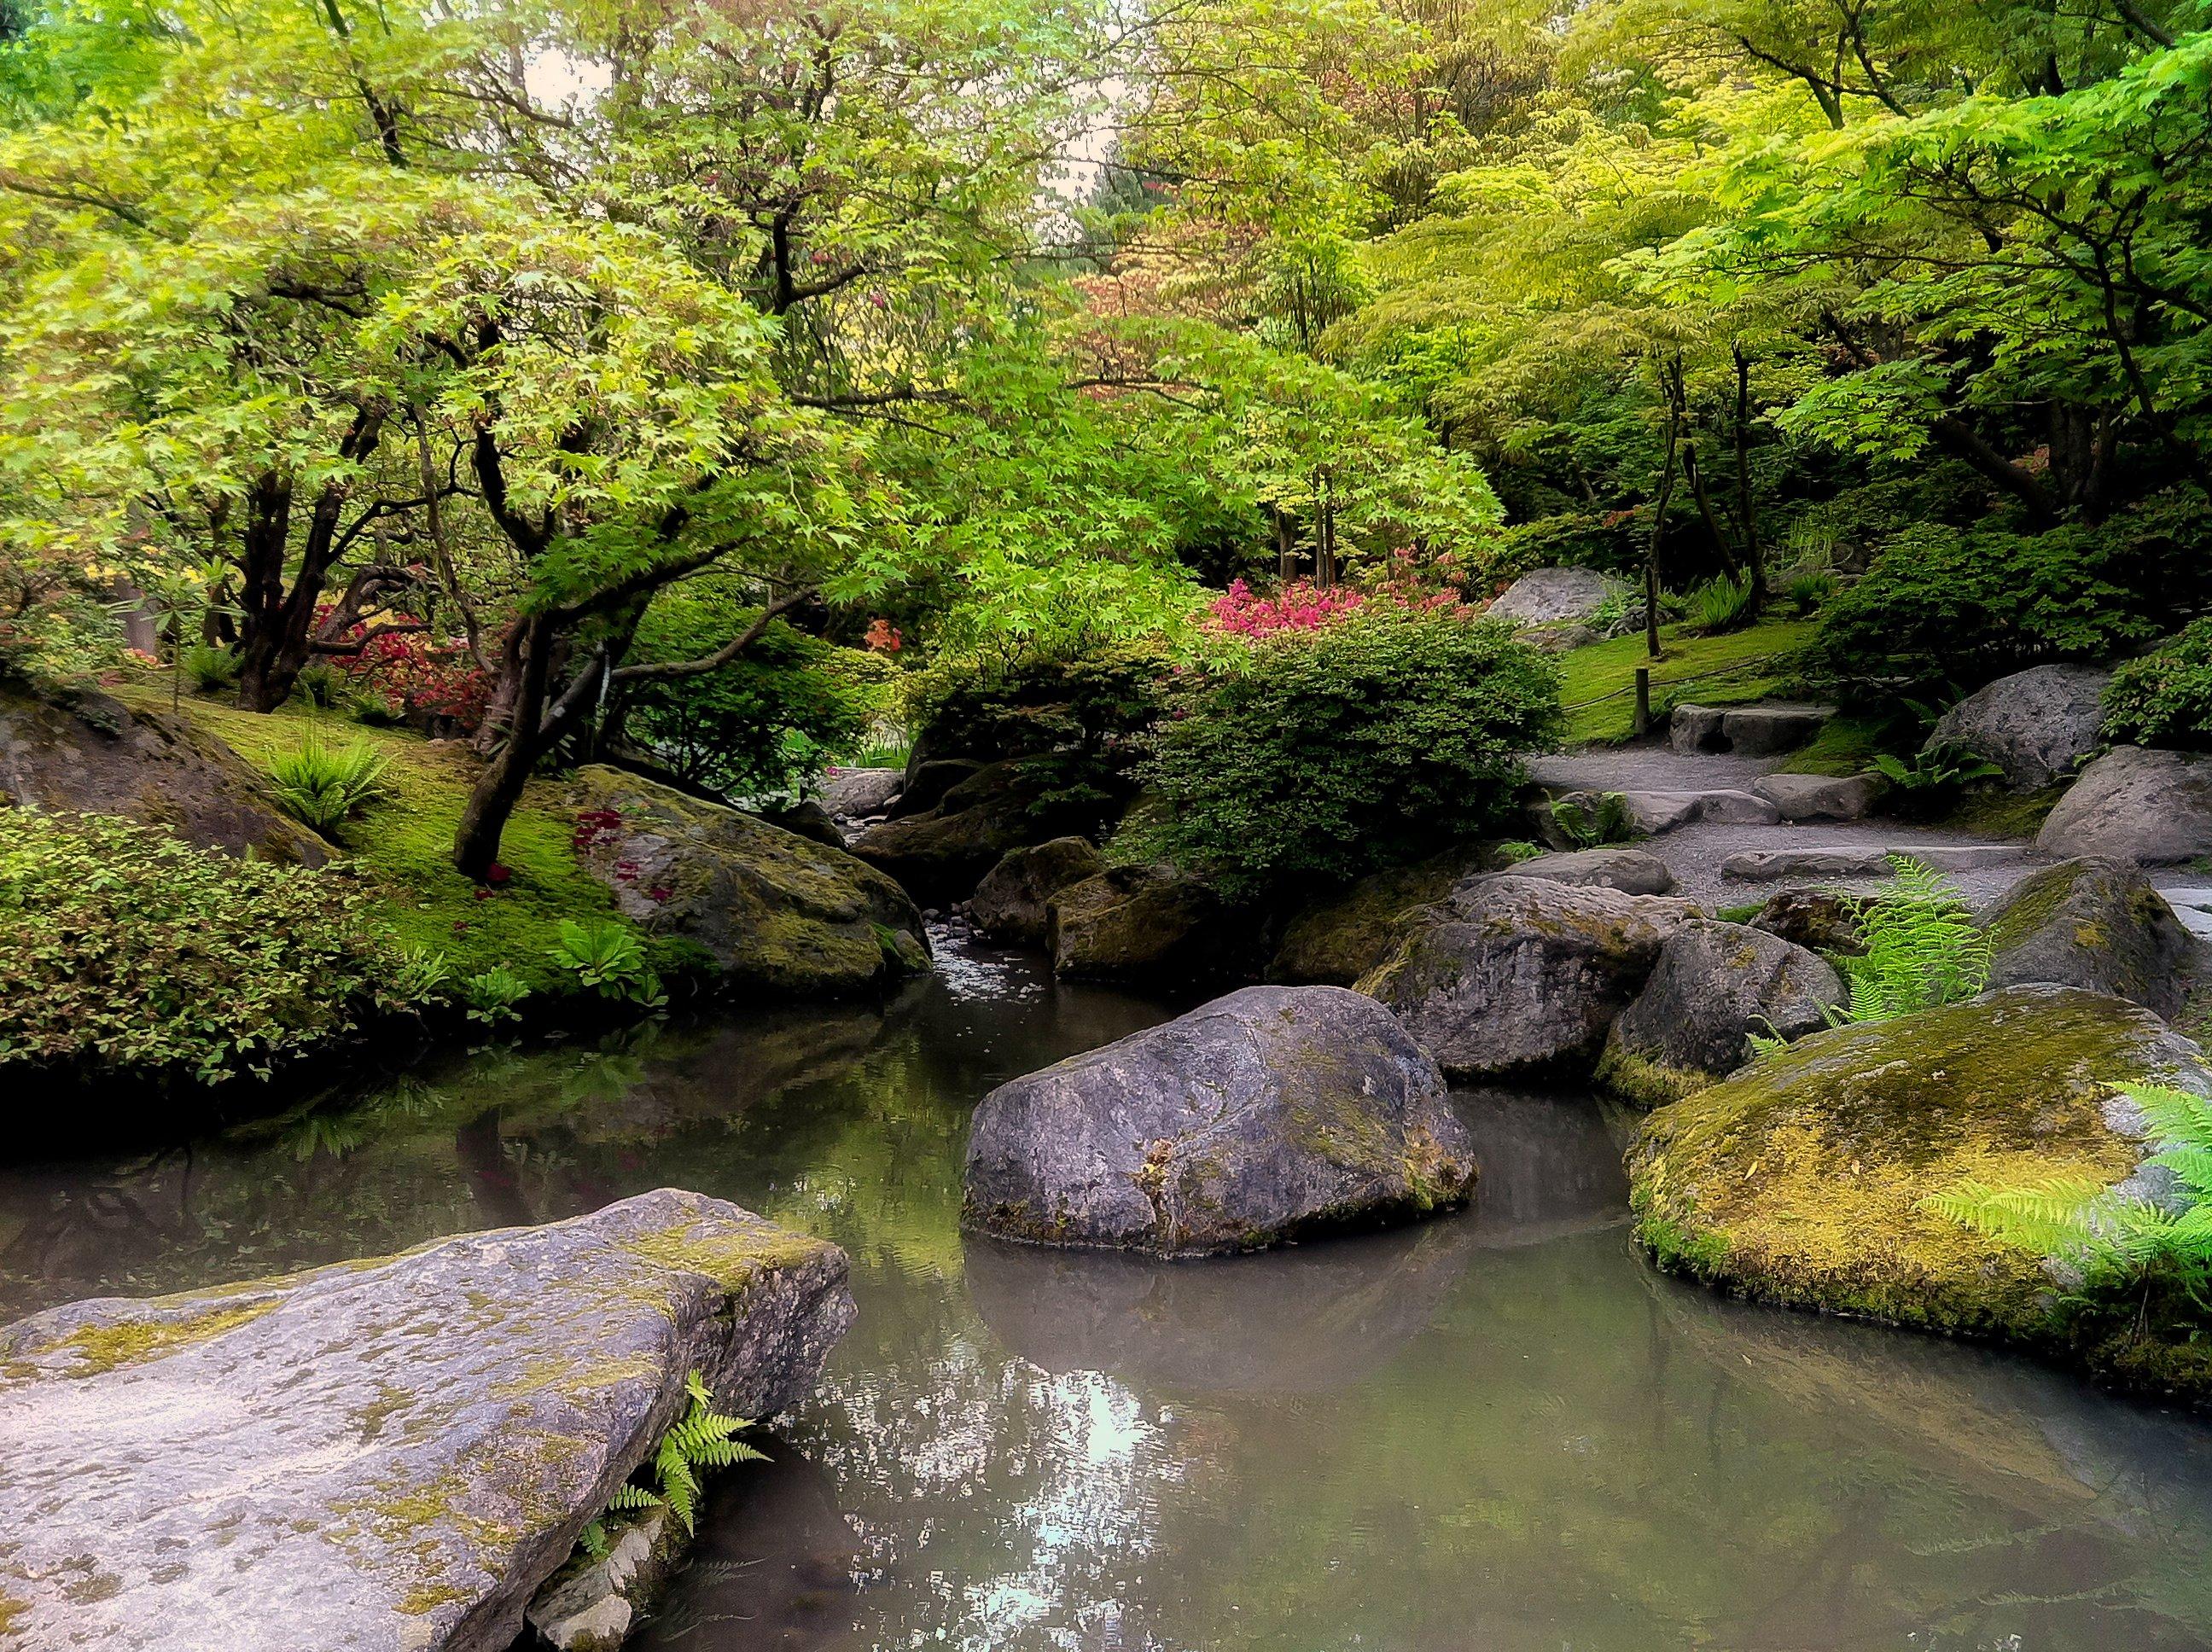 Park trees river rocks landscape japanese garden wallpaper for Japanese garden with rocks